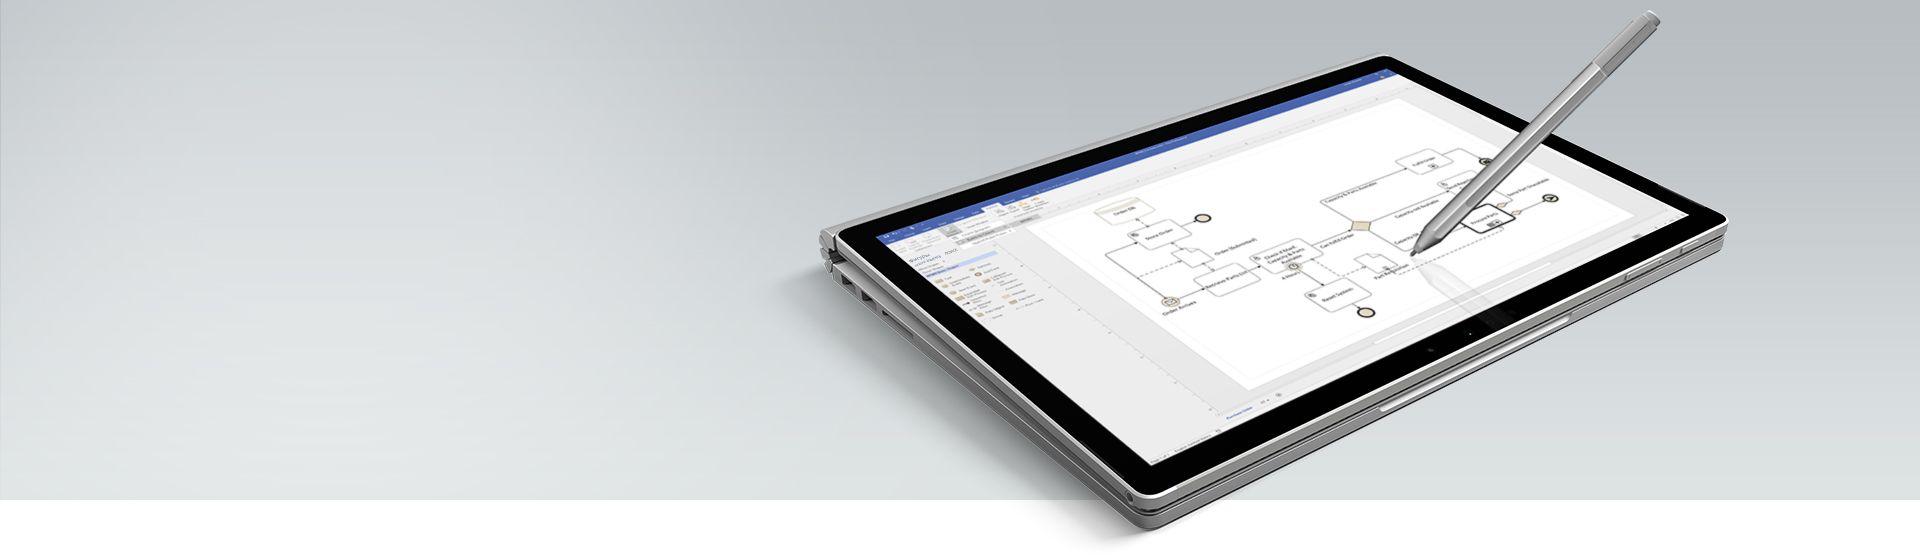 Блок-схема процесса в Visio на экране планшета Surface.